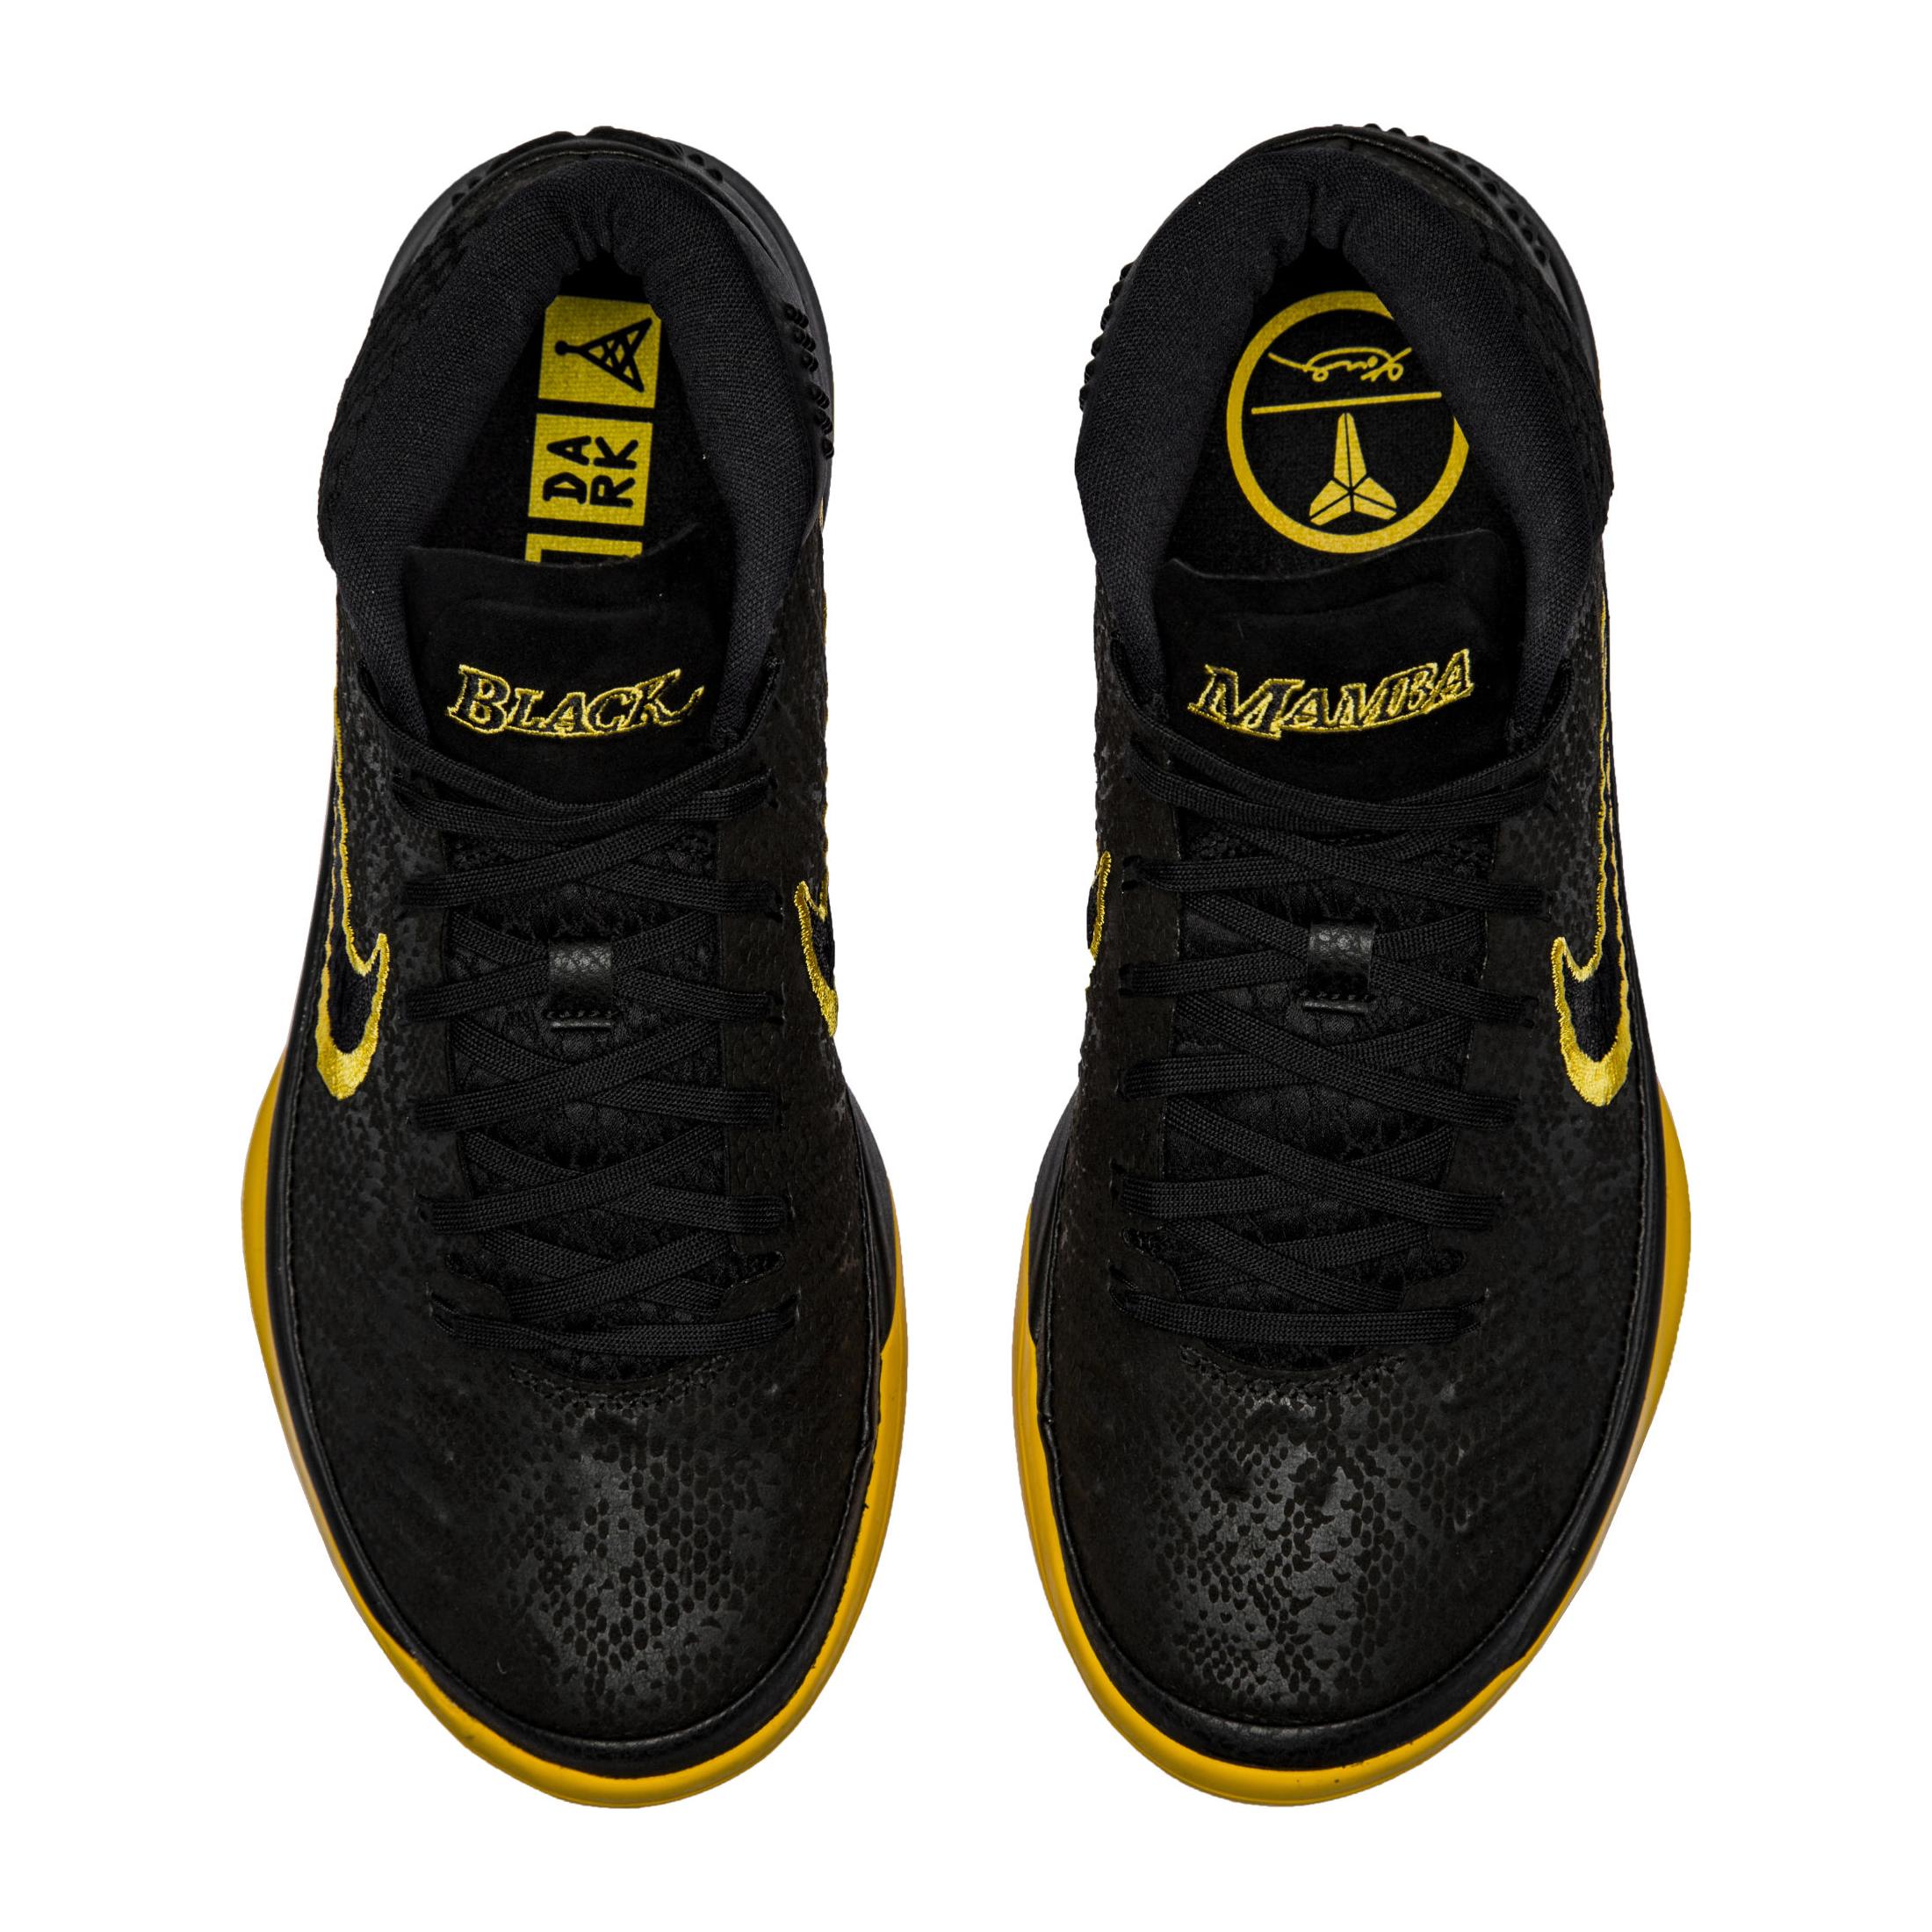 best sneakers a0d31 08836 Nike Kobe AD Black Mamba City Edition 5